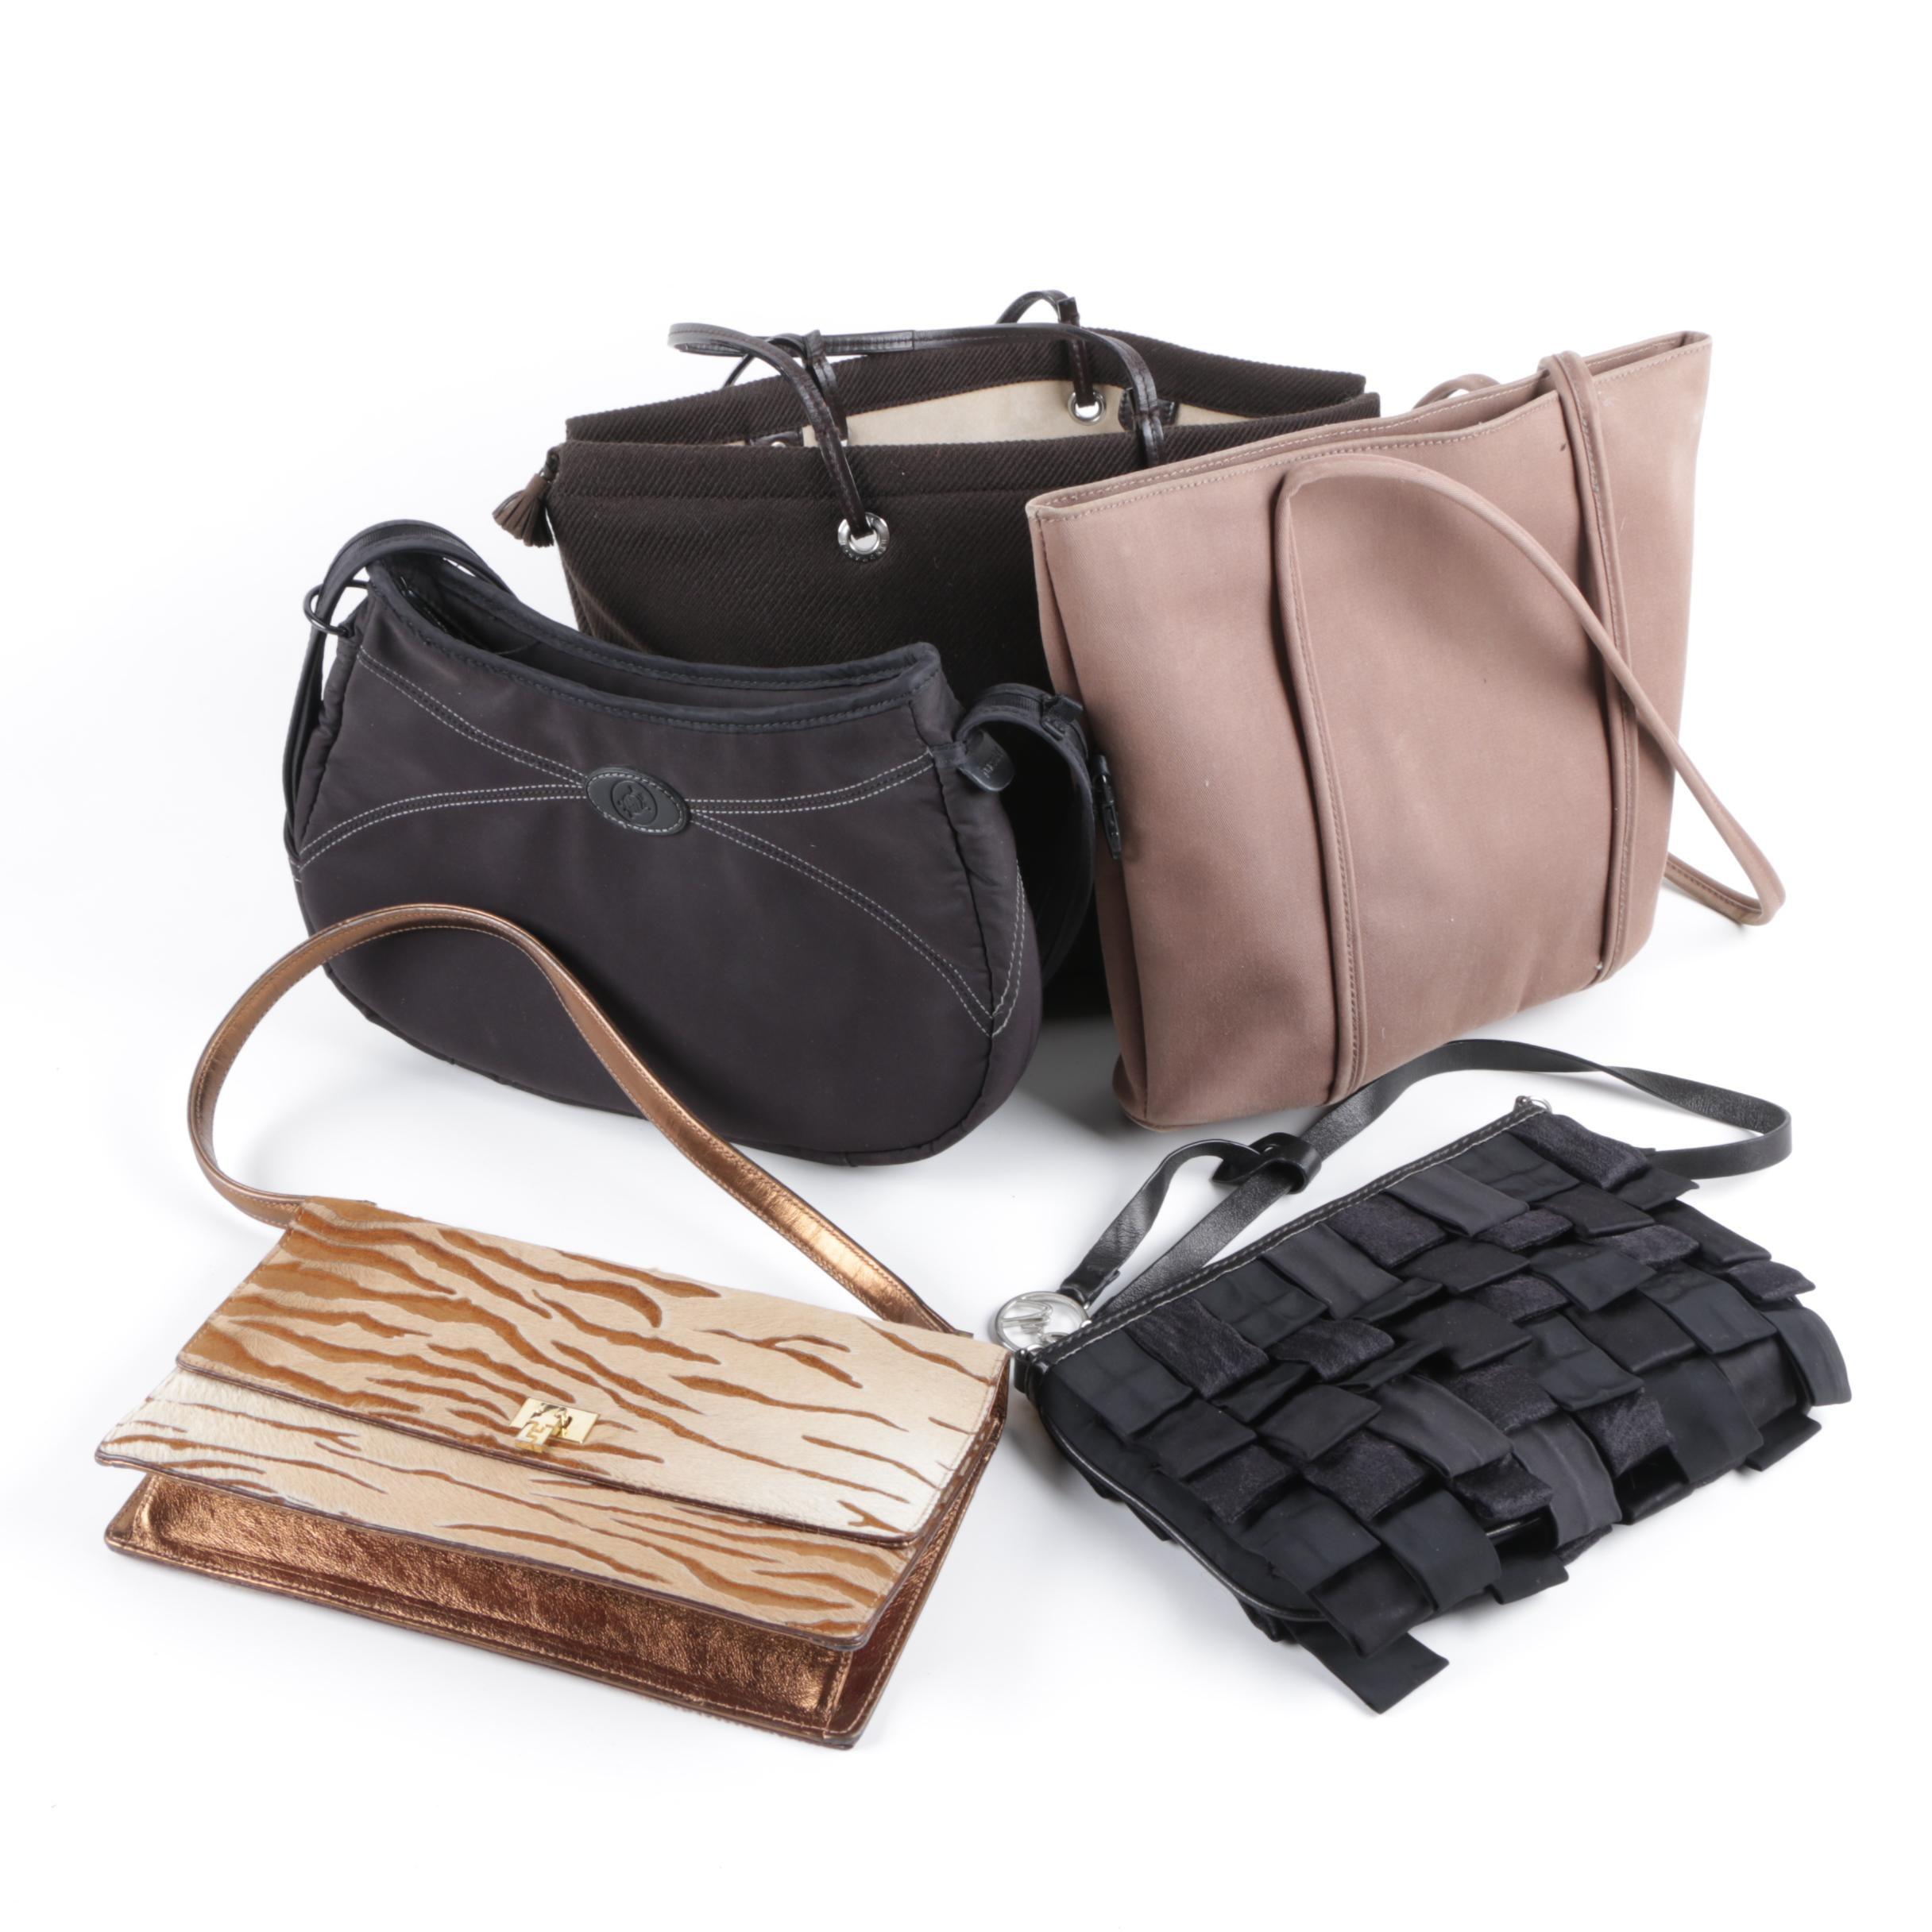 Shoulder Bags Including Lamberston Truex, Max Azria, Tano and Anya Hindmarch